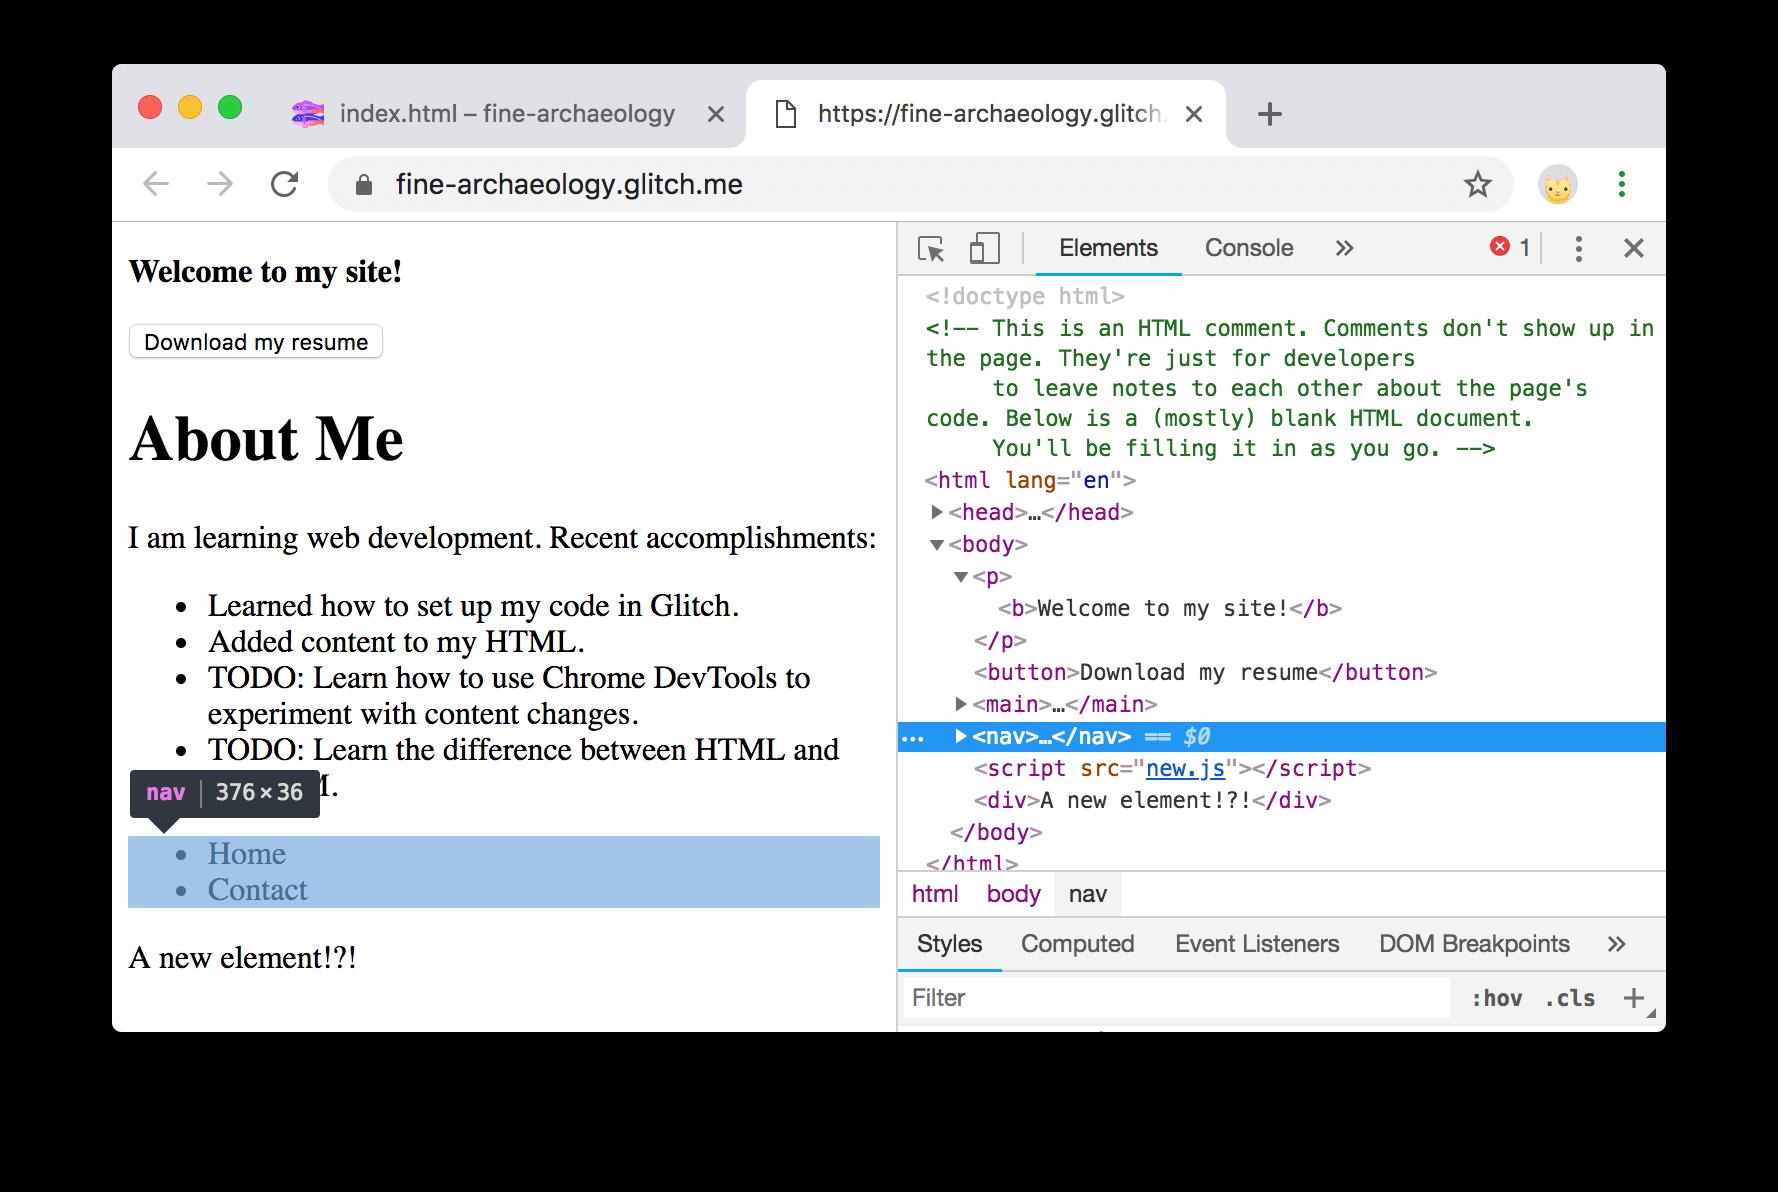 nav节点在DevTools中以蓝色突出显示。